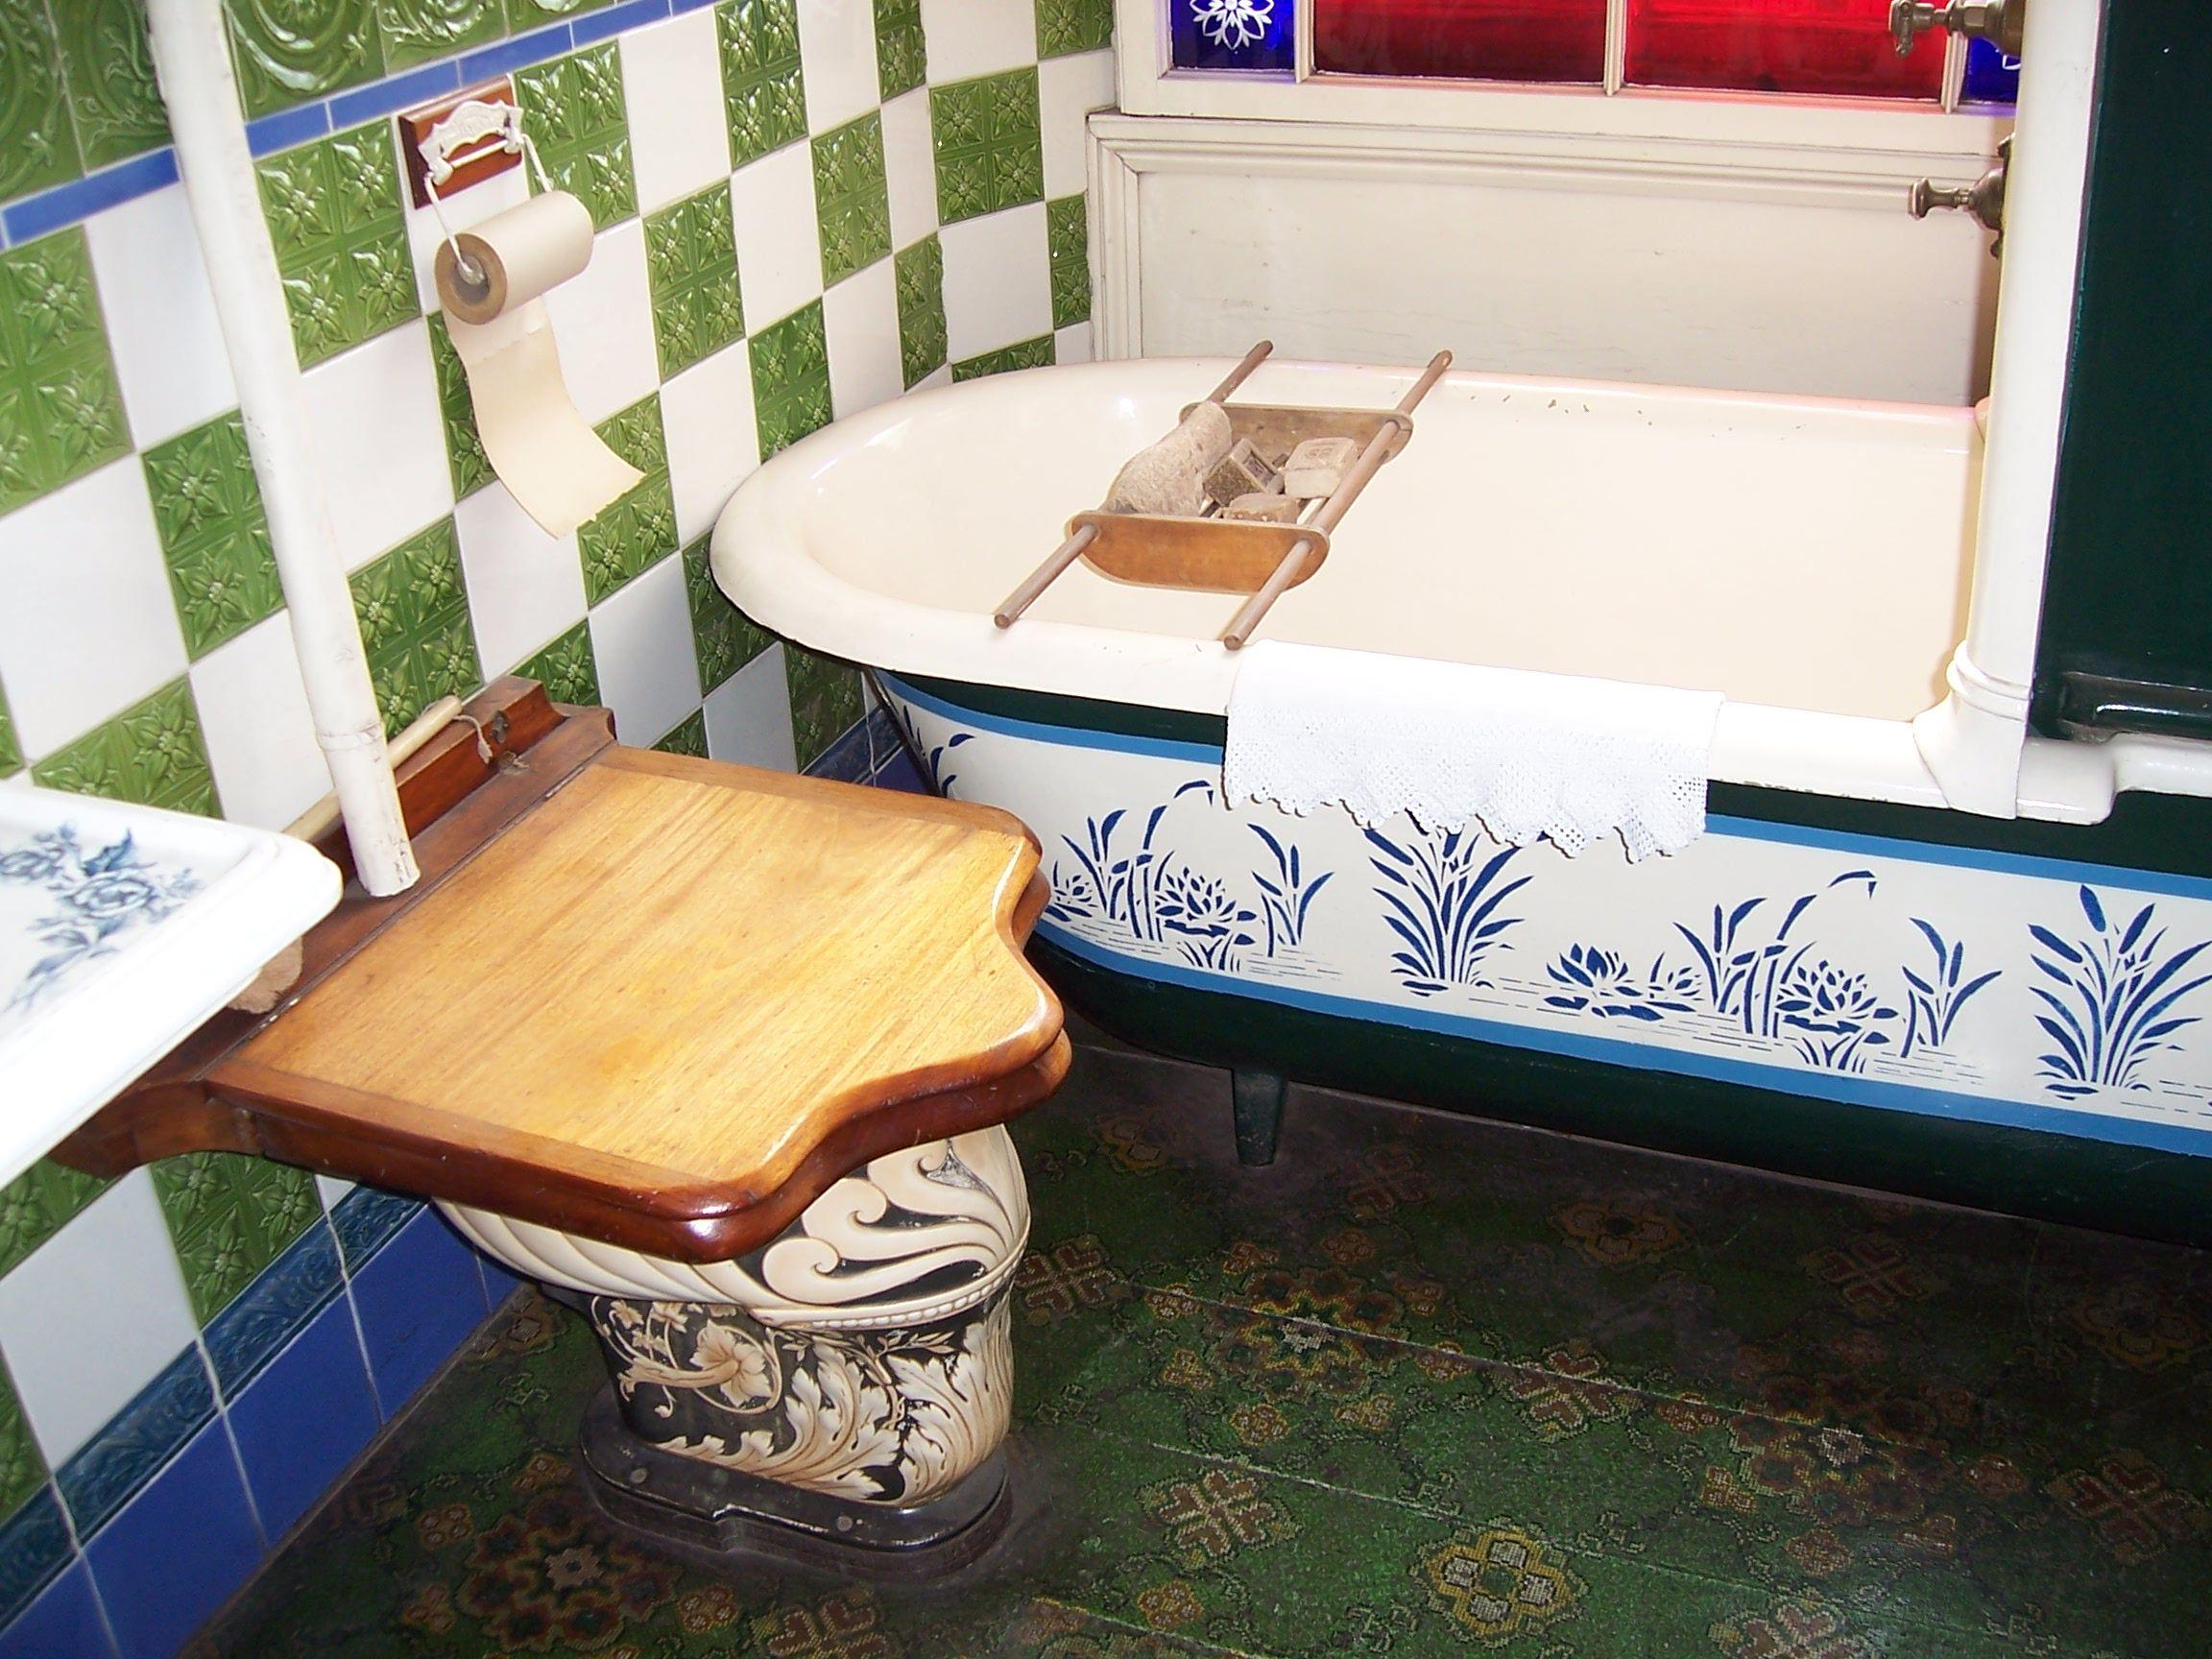 beamish museum 1900s bathroom victorian edwardian 1920s bathroom